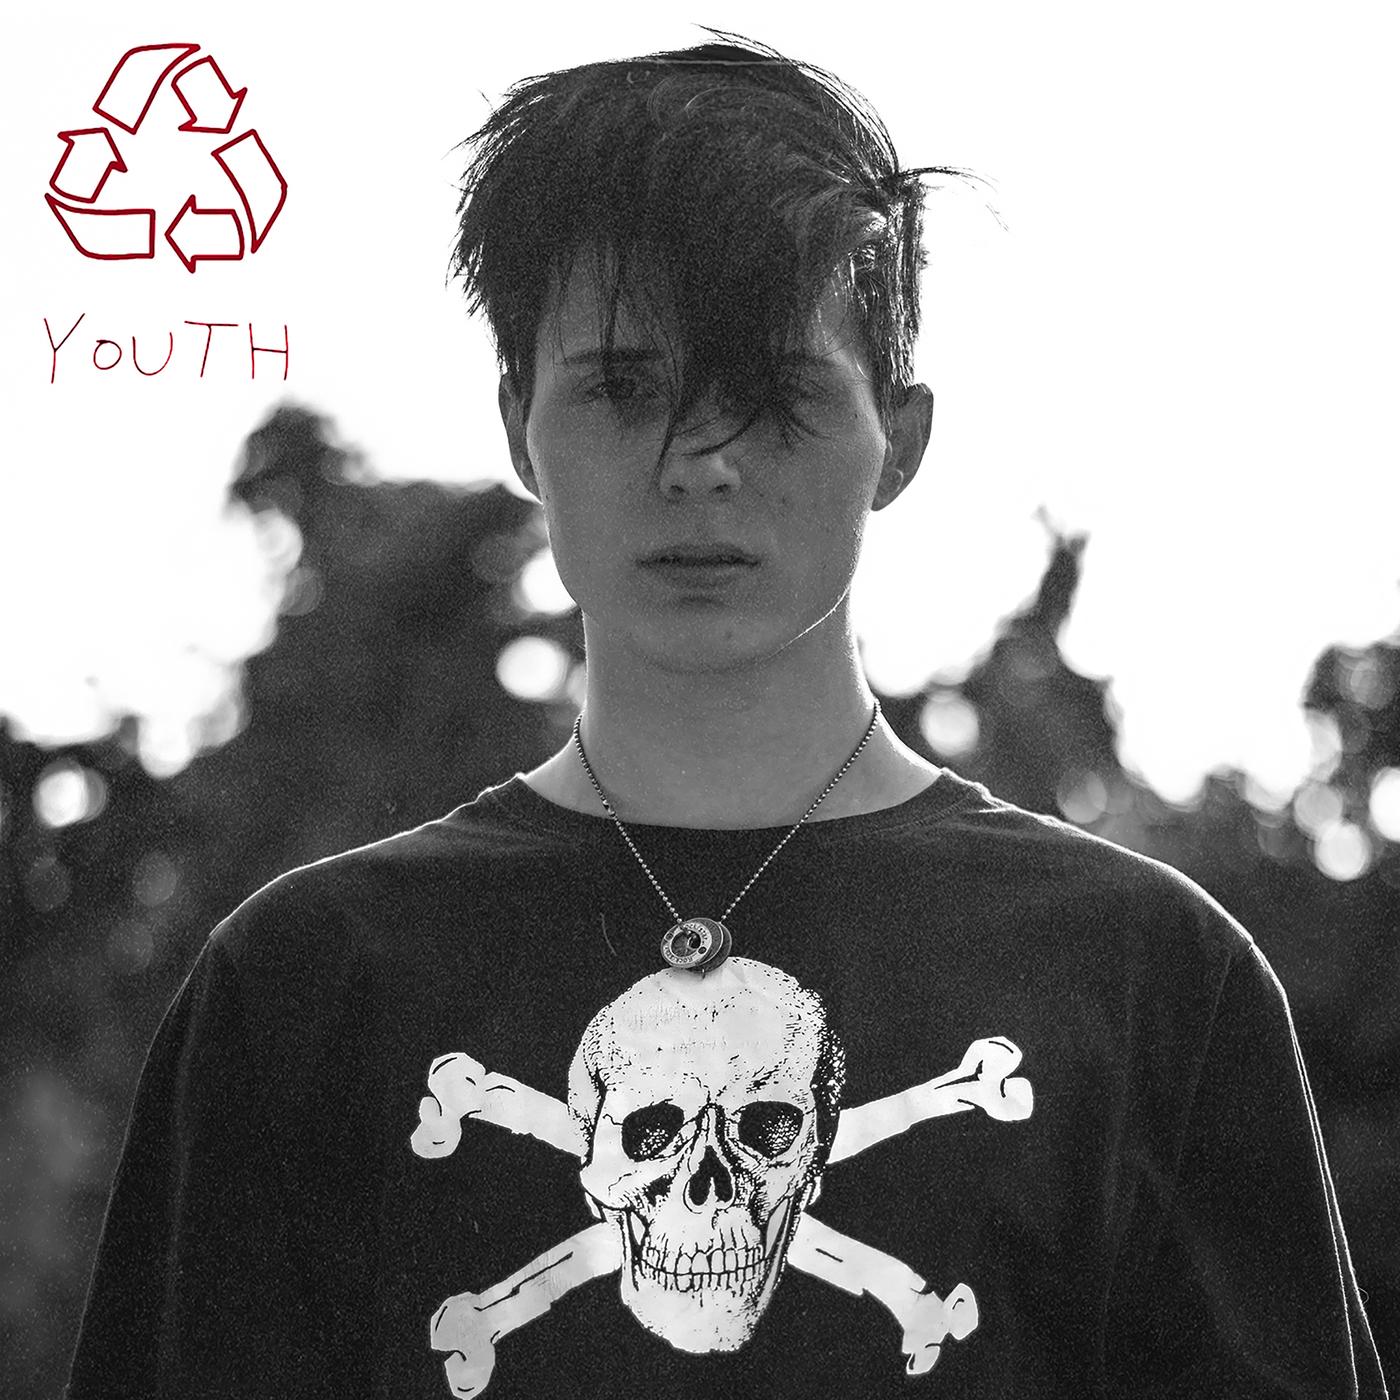 Recycled Youth - Call Me Karizma